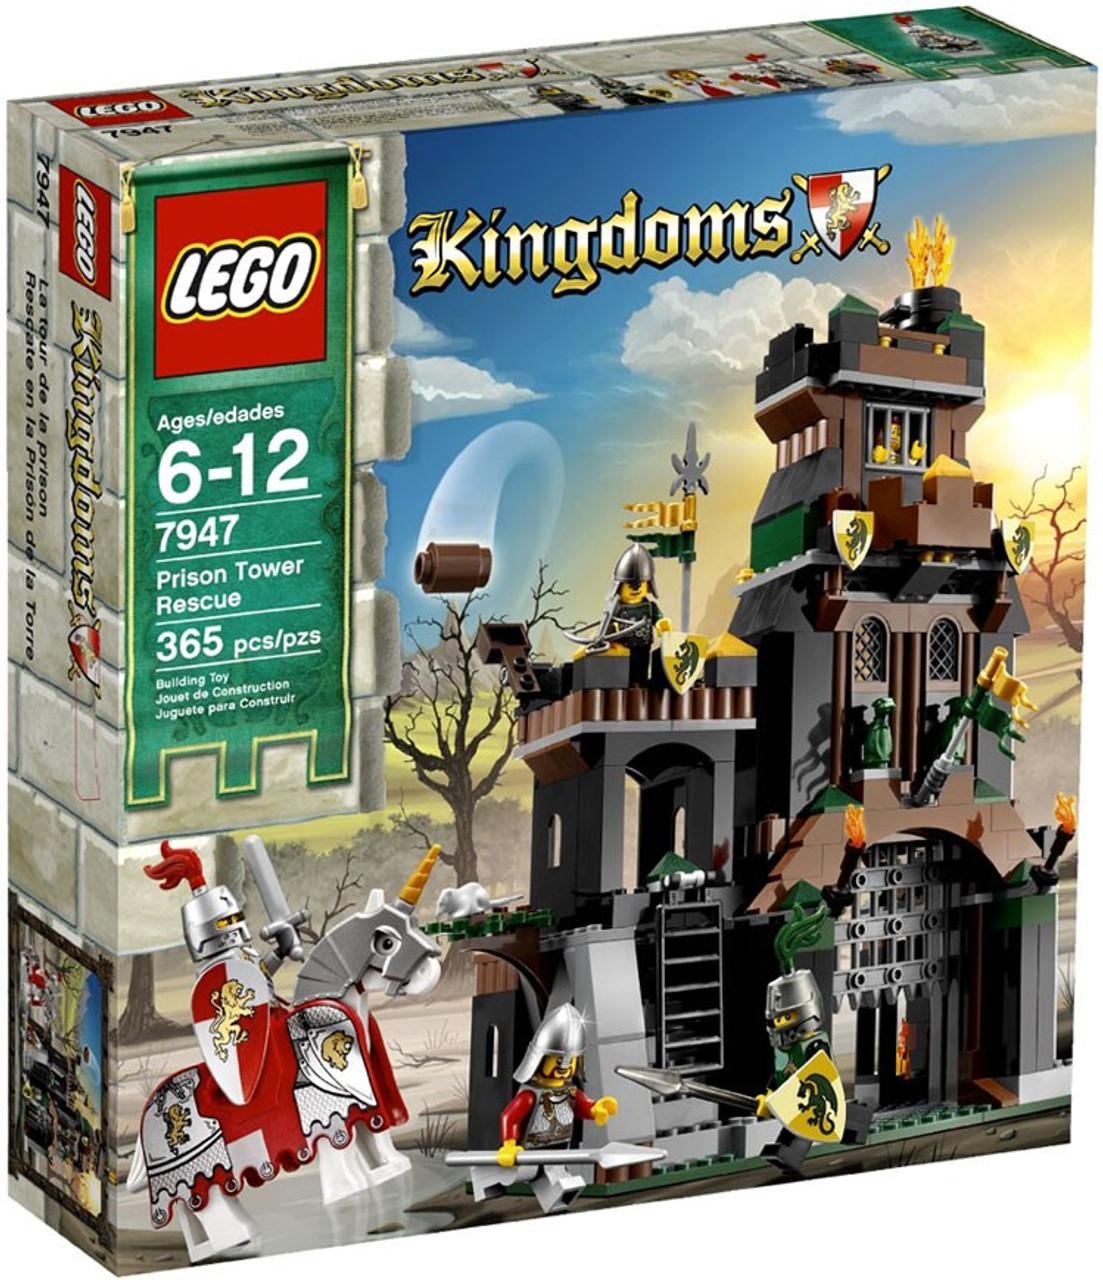 LEGO Kingdoms Prison Tower Rescue Set #7947